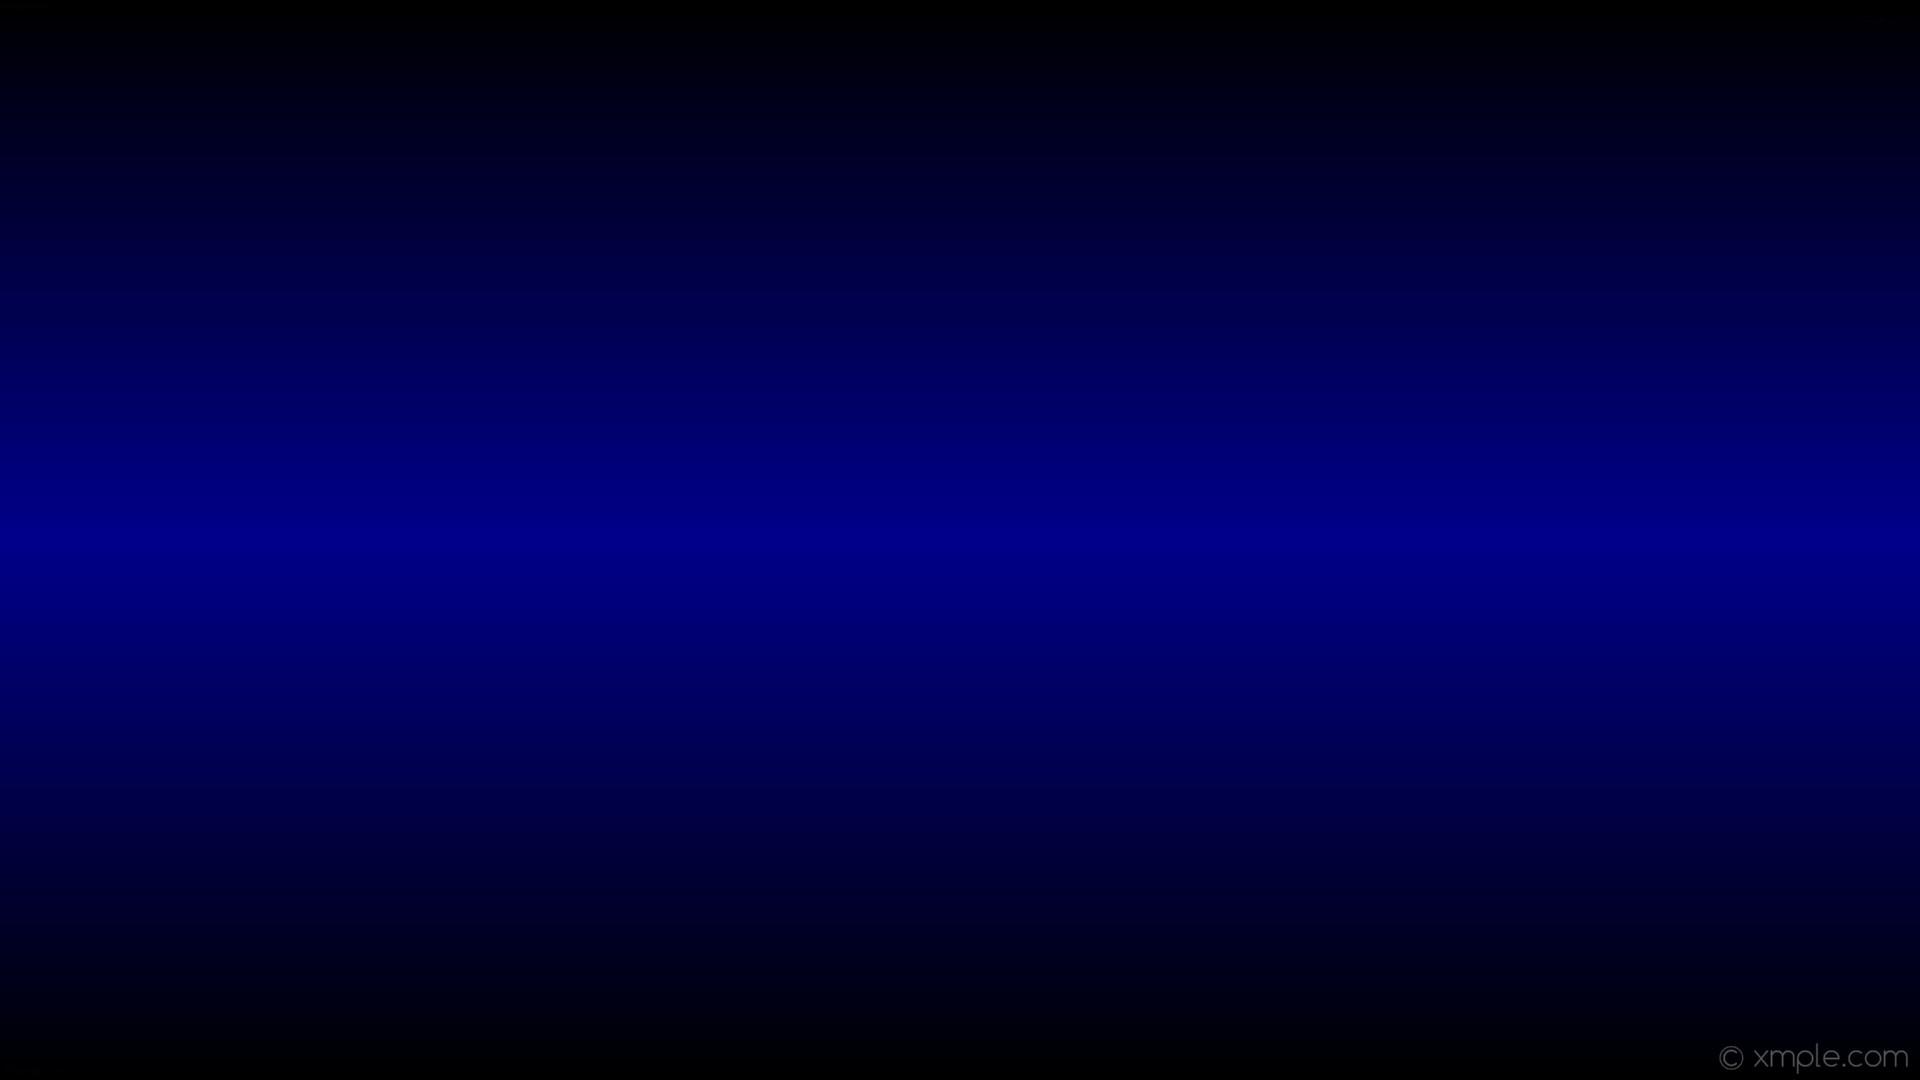 Blue Desktop Wallpaper 77 Pictures